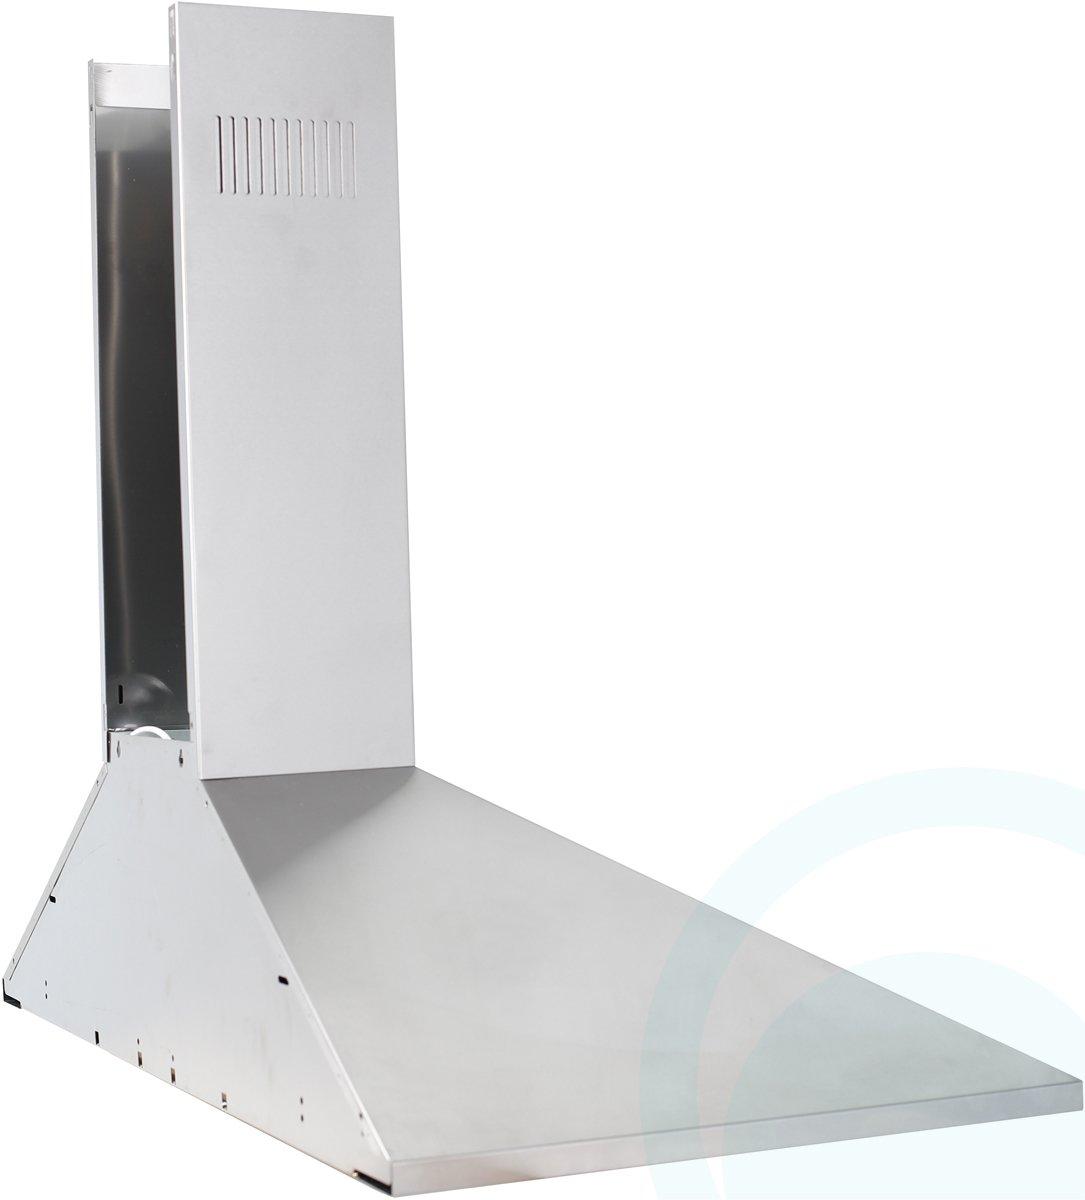 Westinghouse WRF900CS 90cm Canopy Rangehood. Product Video  sc 1 st  Appliances Online & Westinghouse WRF900CS 90cm Canopy Rangehood | Appliances Online